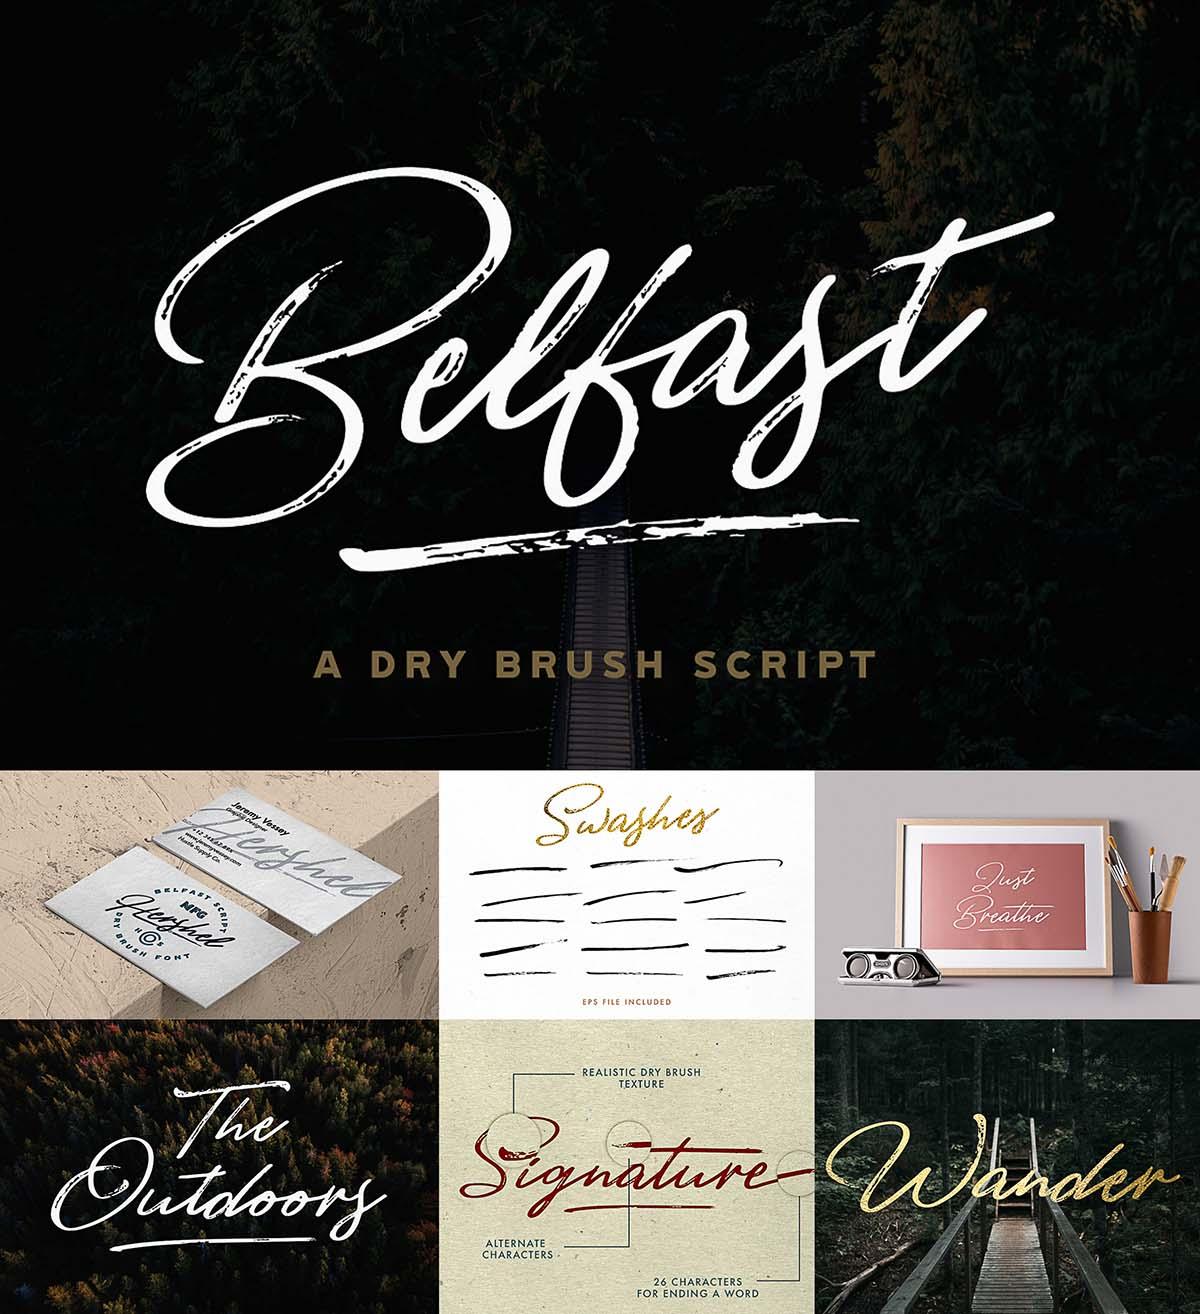 Belfast brush script